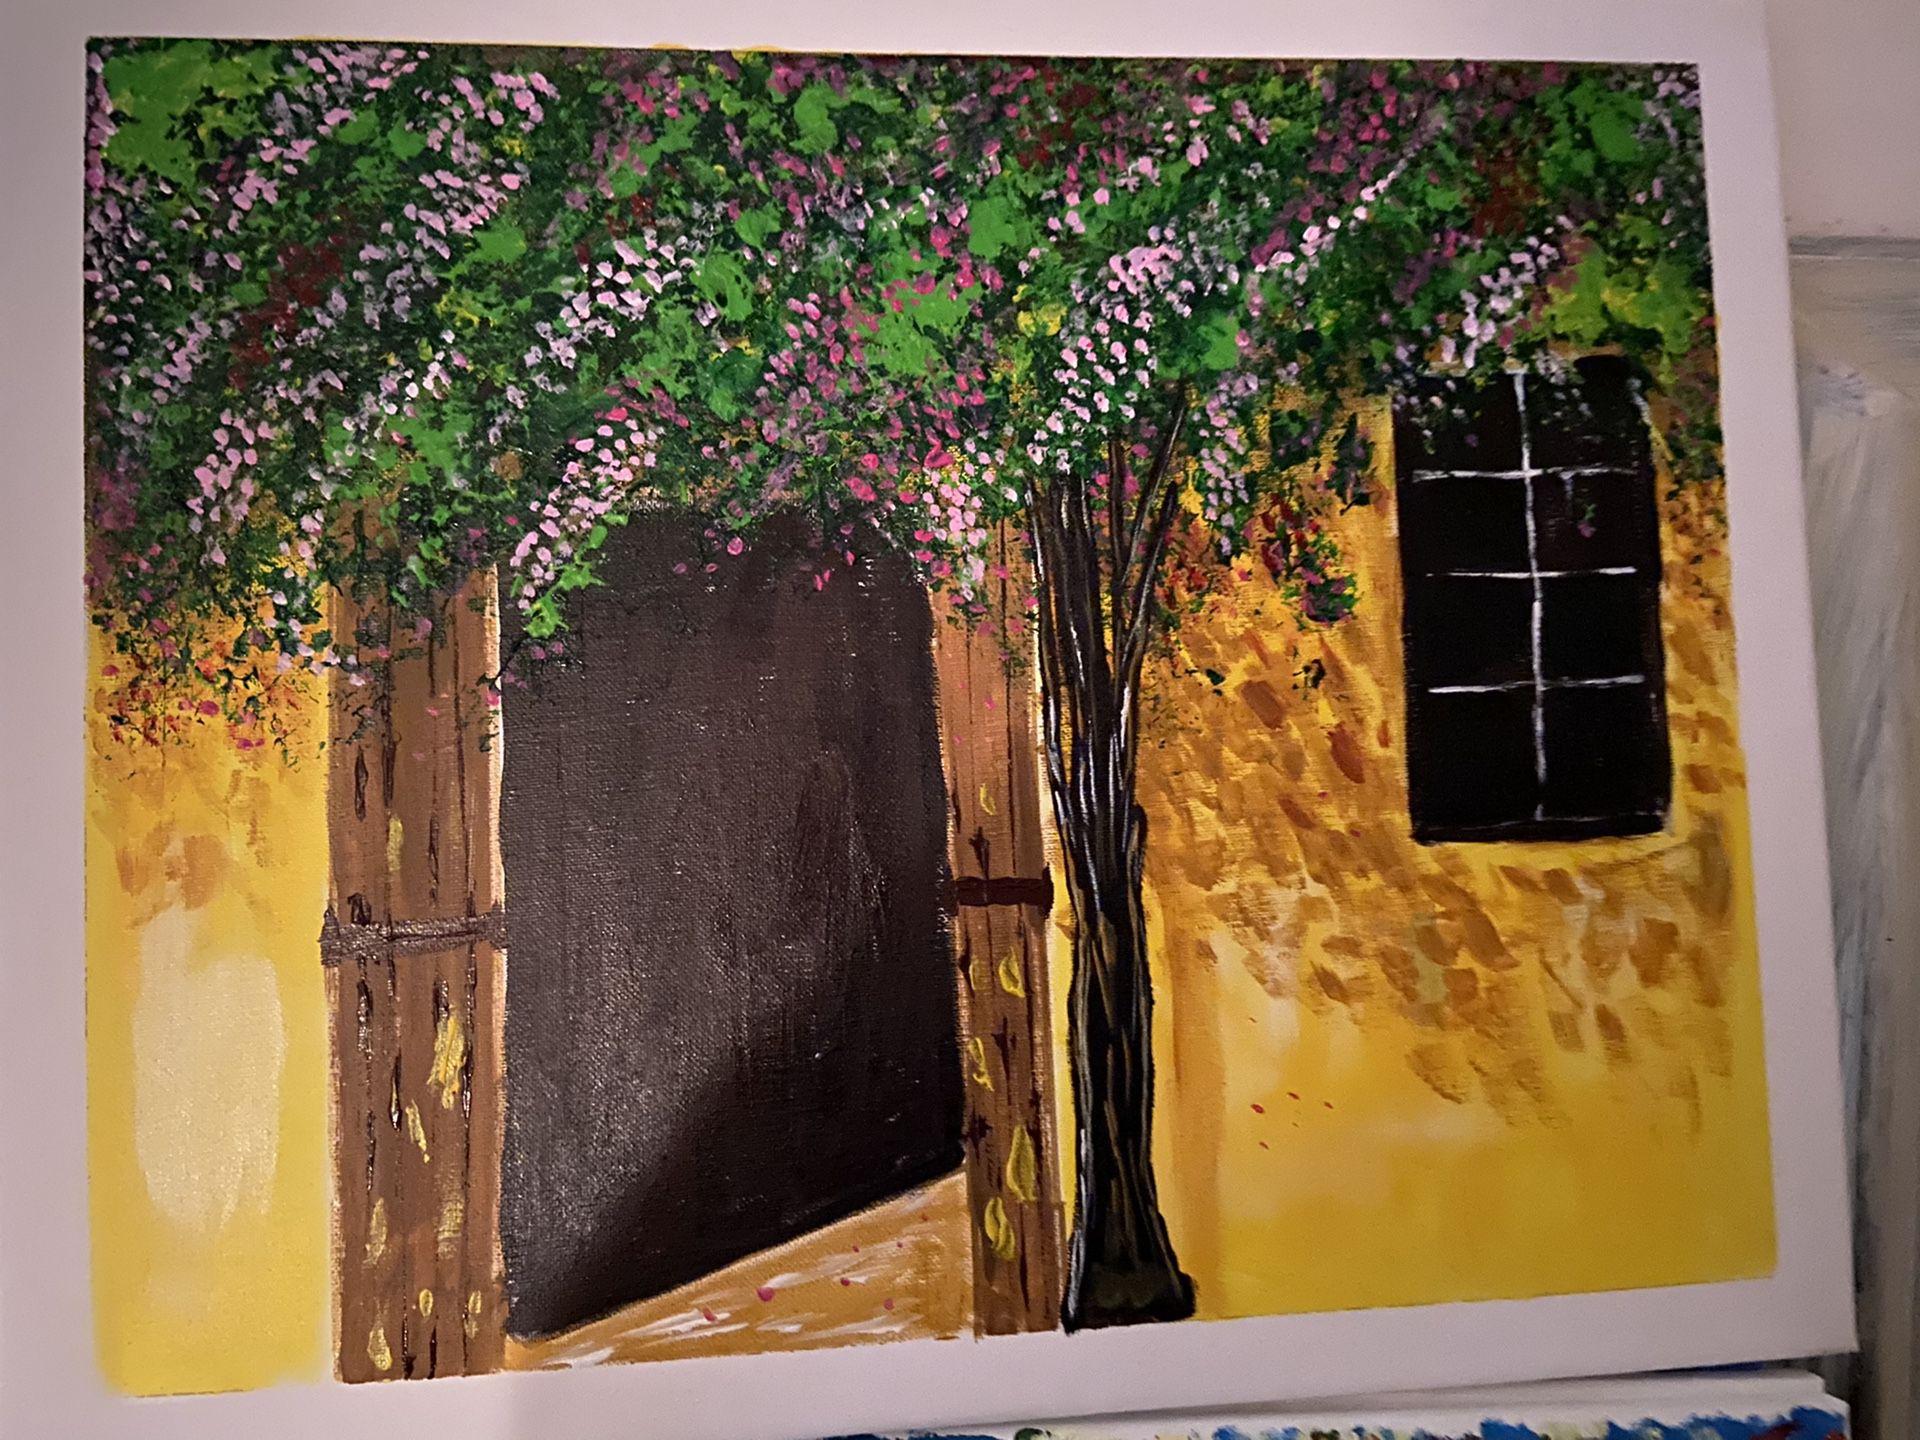 16 x 20 Art Canvas Painting